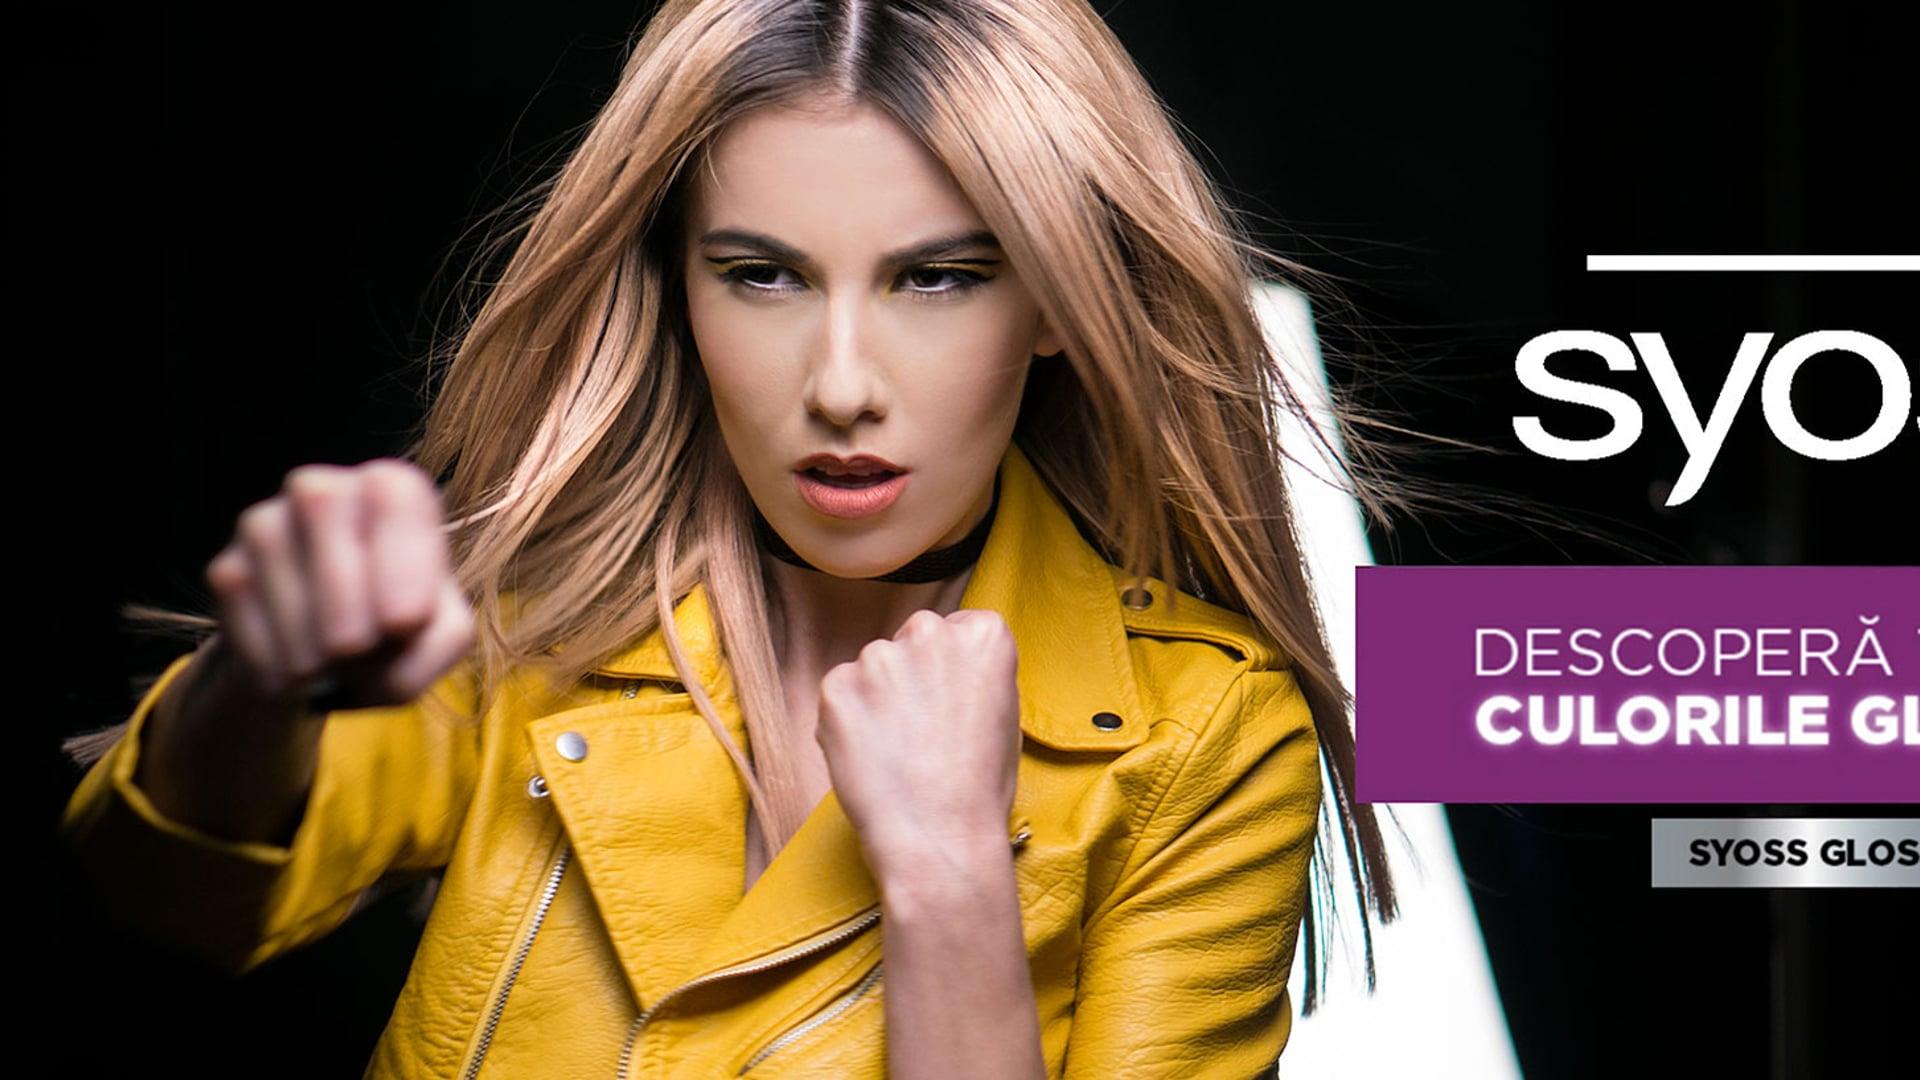 Alexandru don -SYOSS Gloss Sensation Campaign